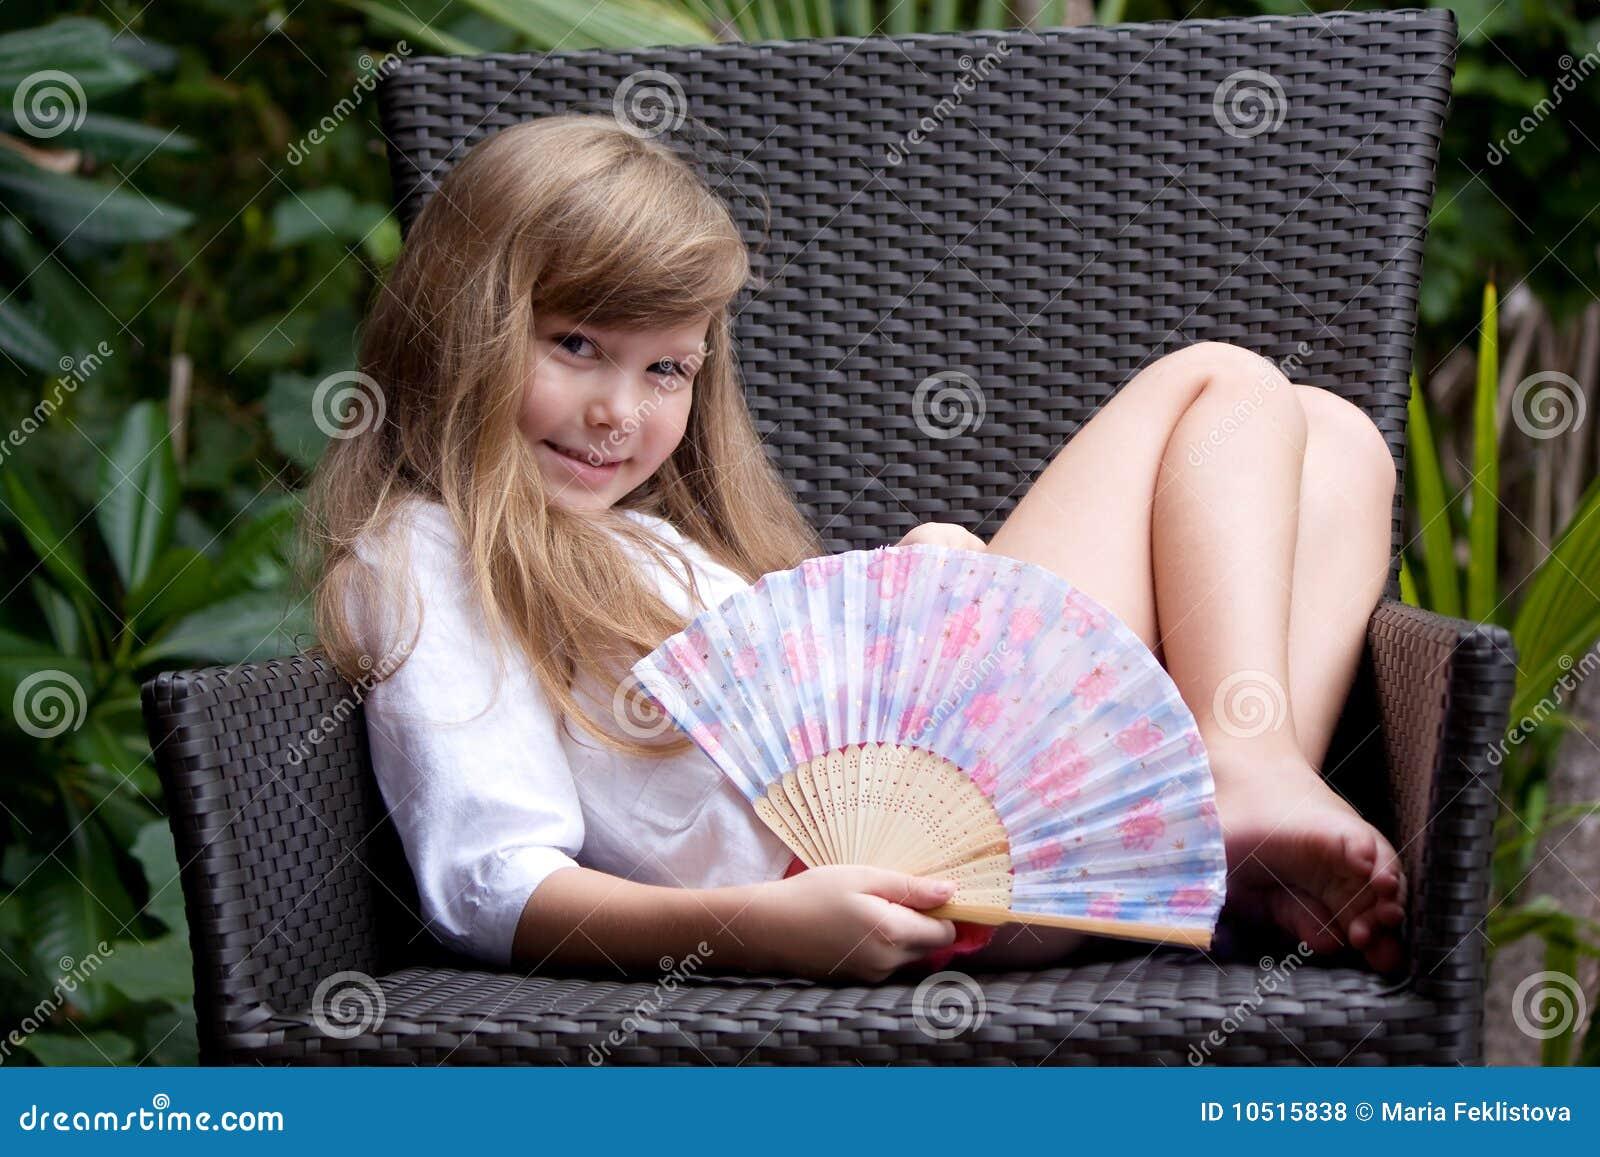 Little girl in the garden-chair